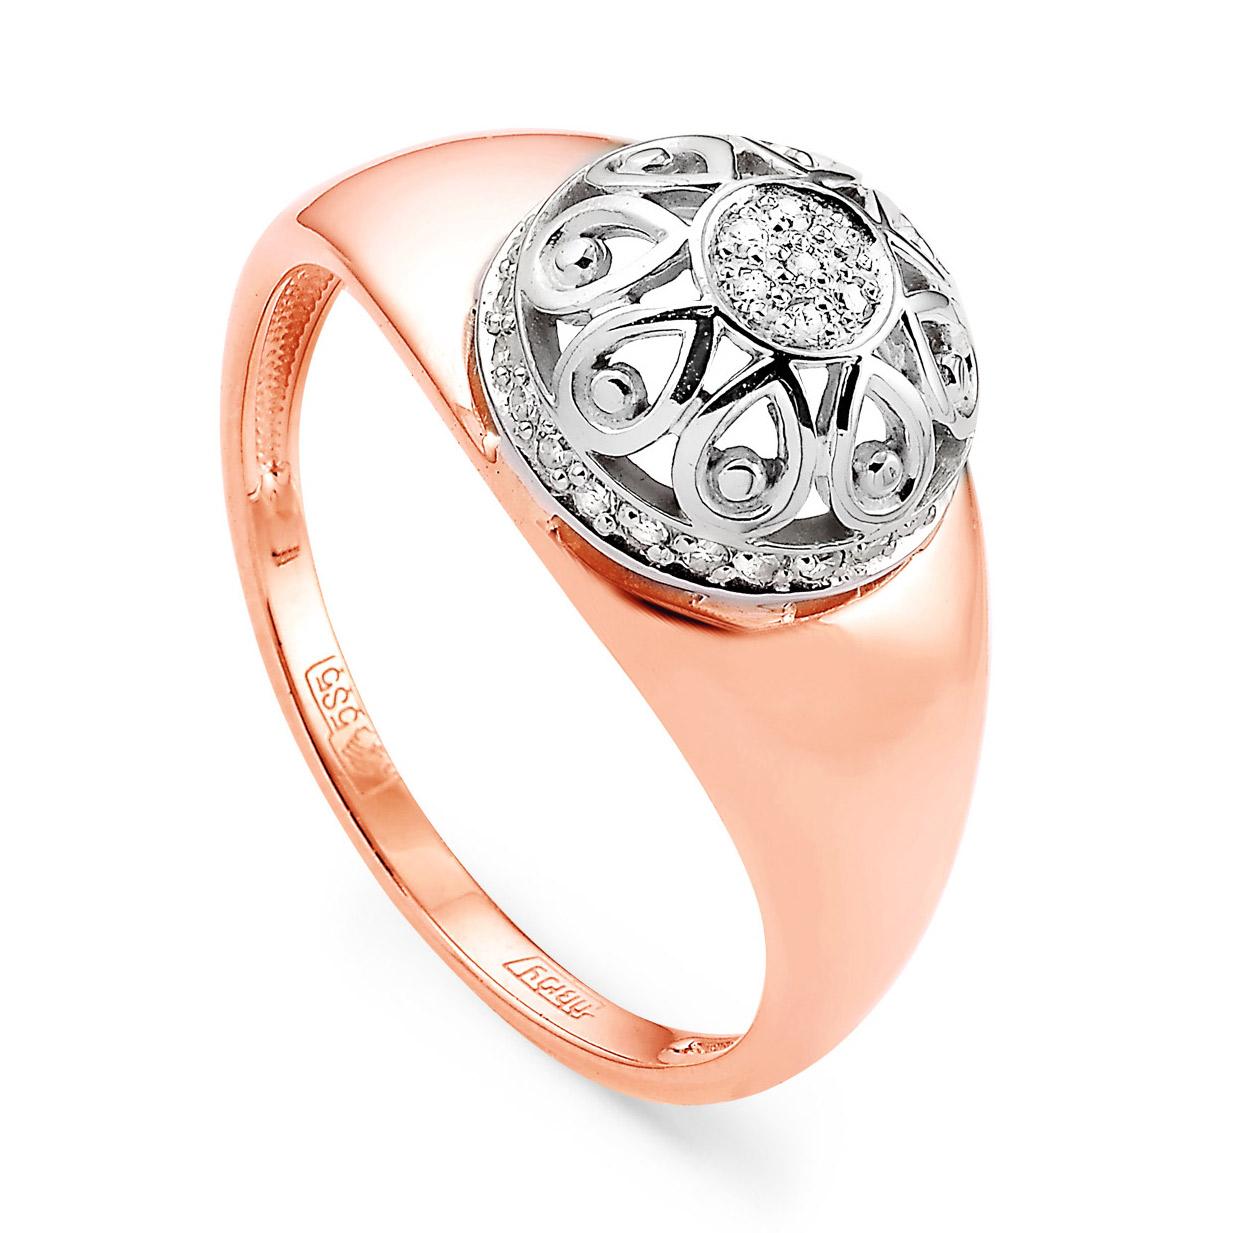 Золотое кольцо Бриллиант арт. 11-0583-1000 11-0583-1000